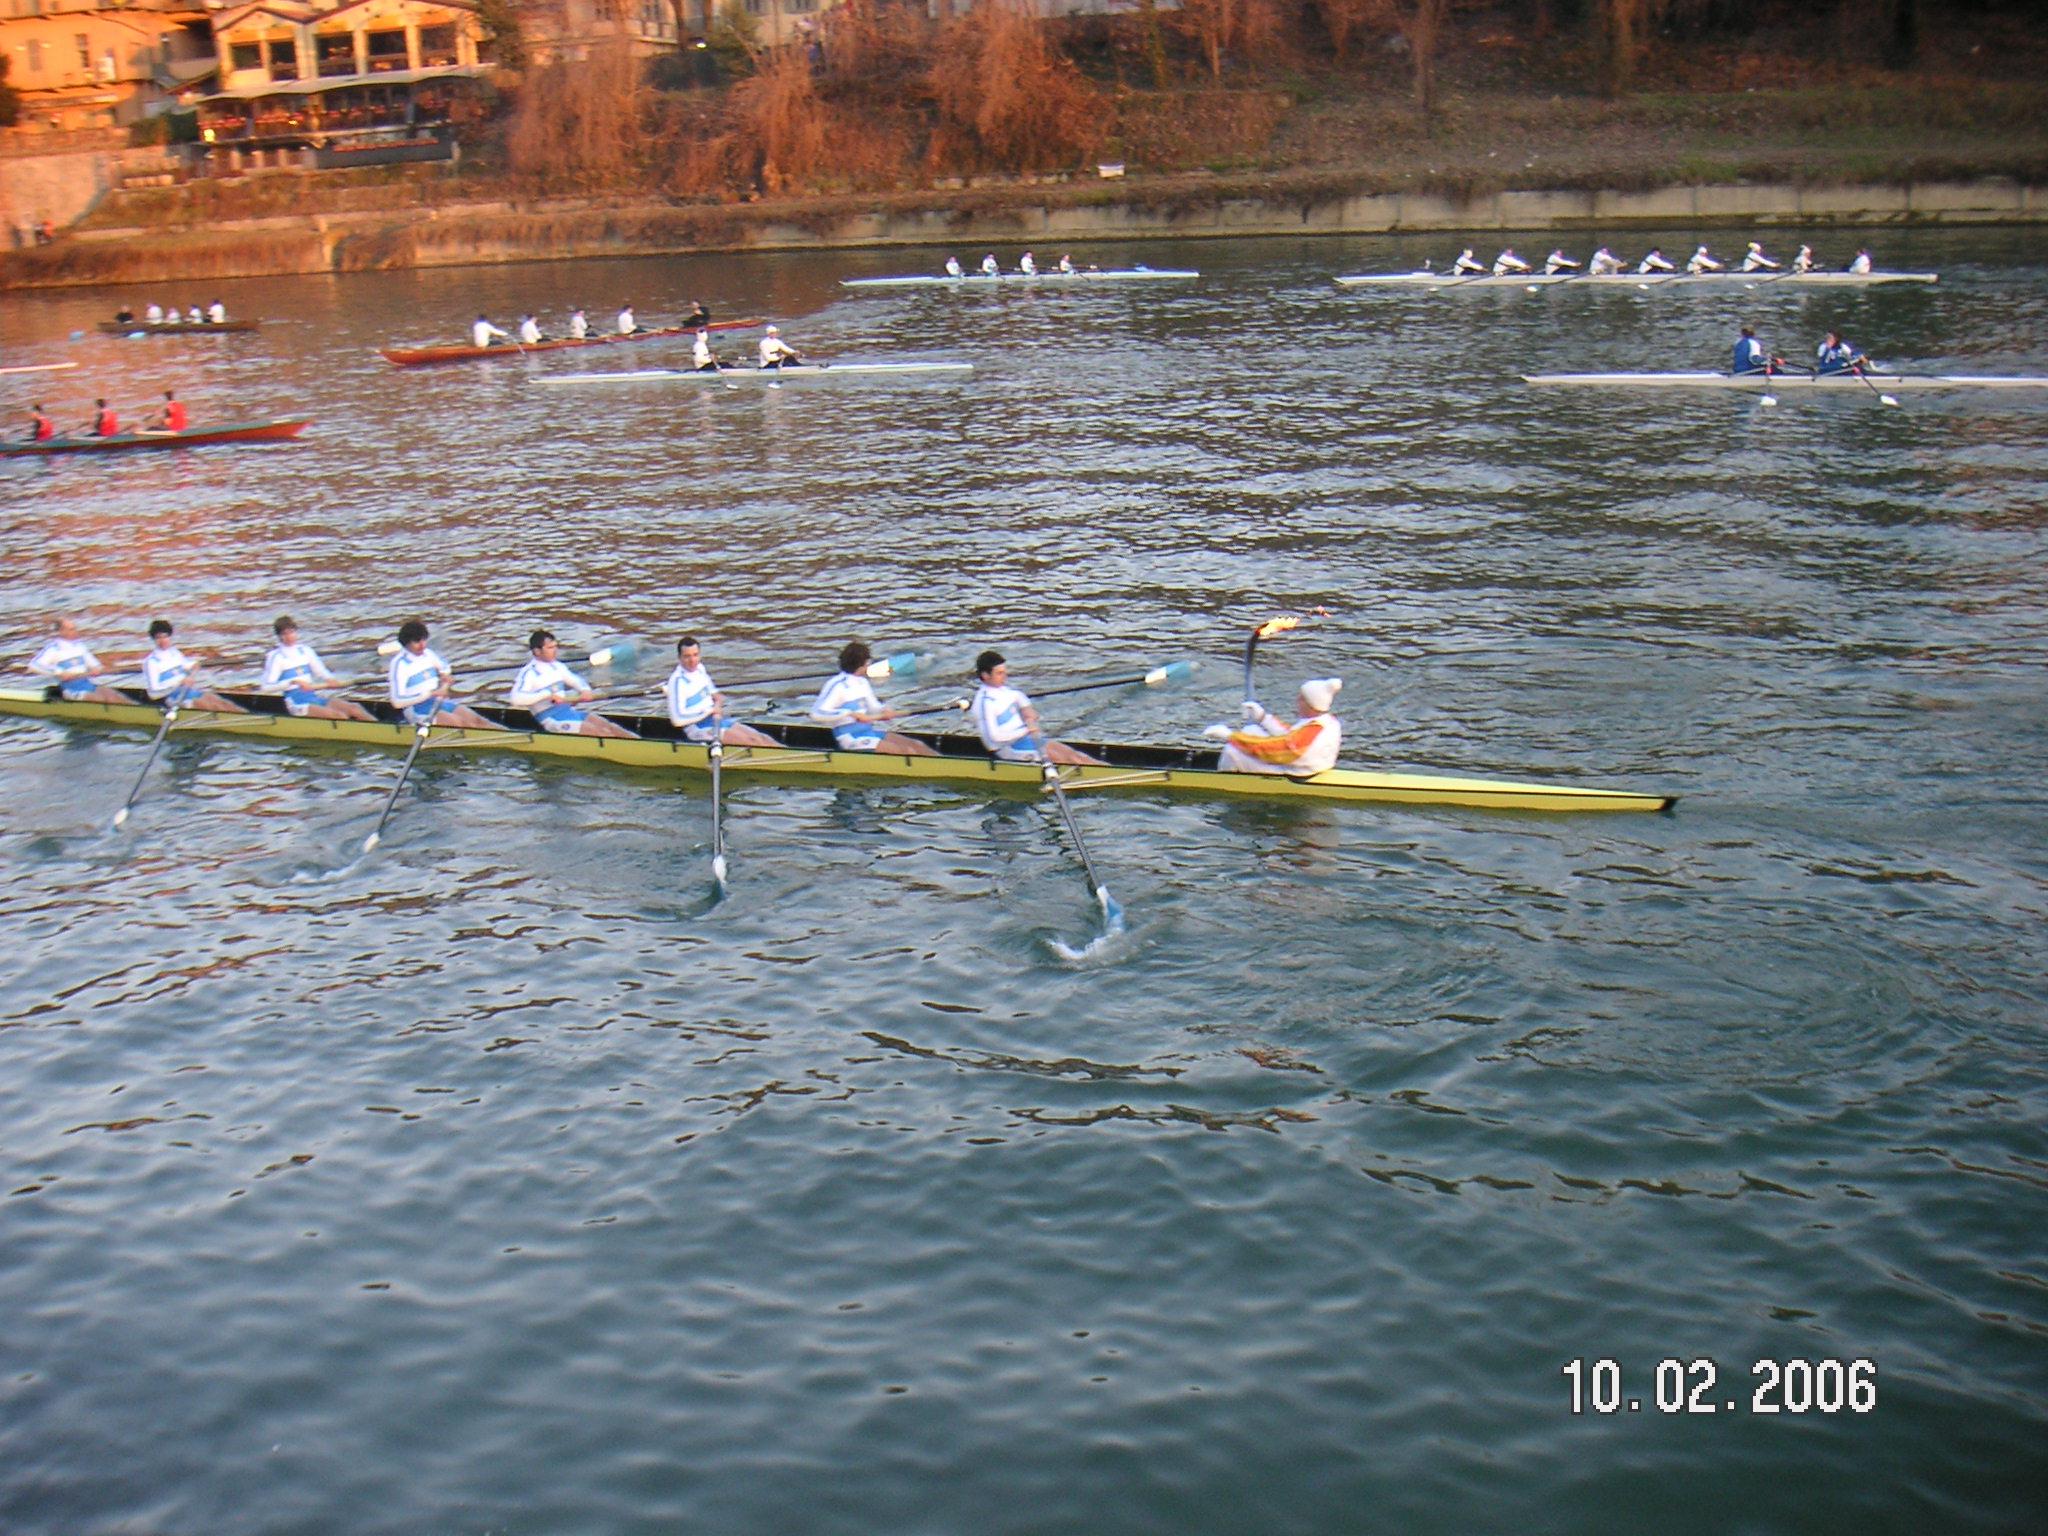 Torino 2006 olympic torch on canoe2.jpg